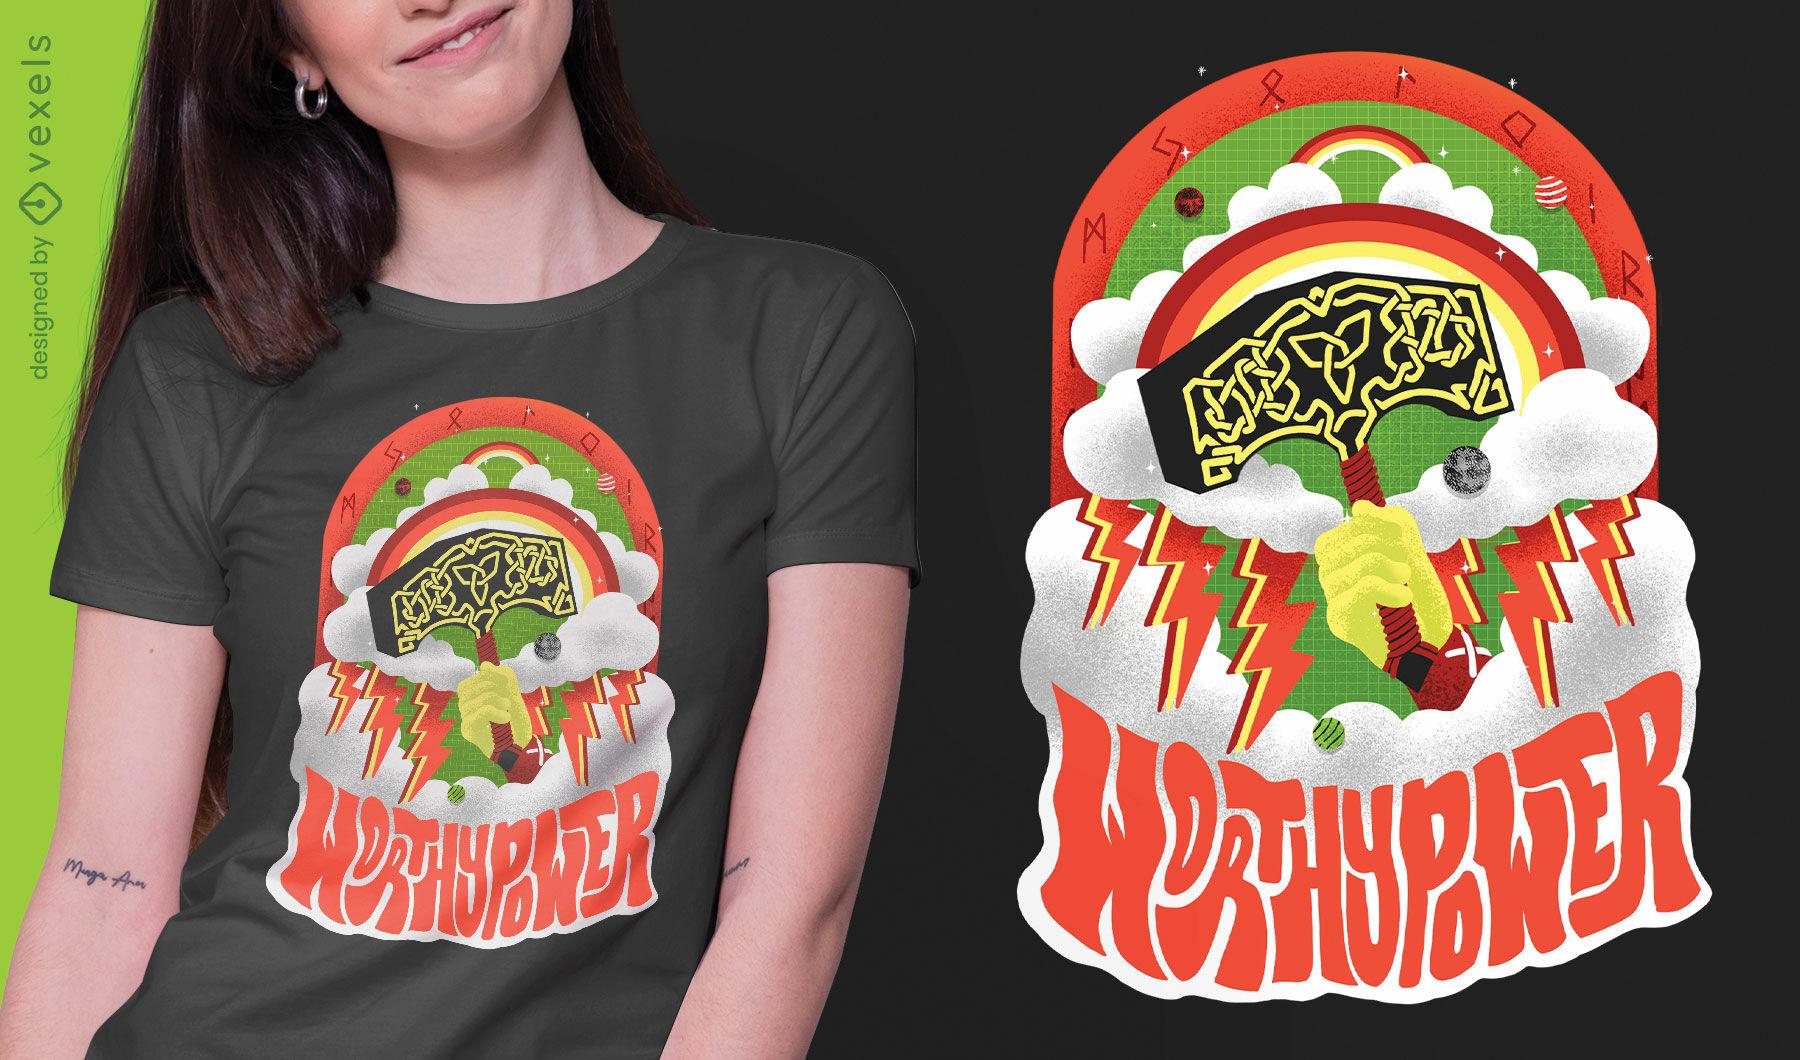 Worthy power viking trippy psd t-shirt design